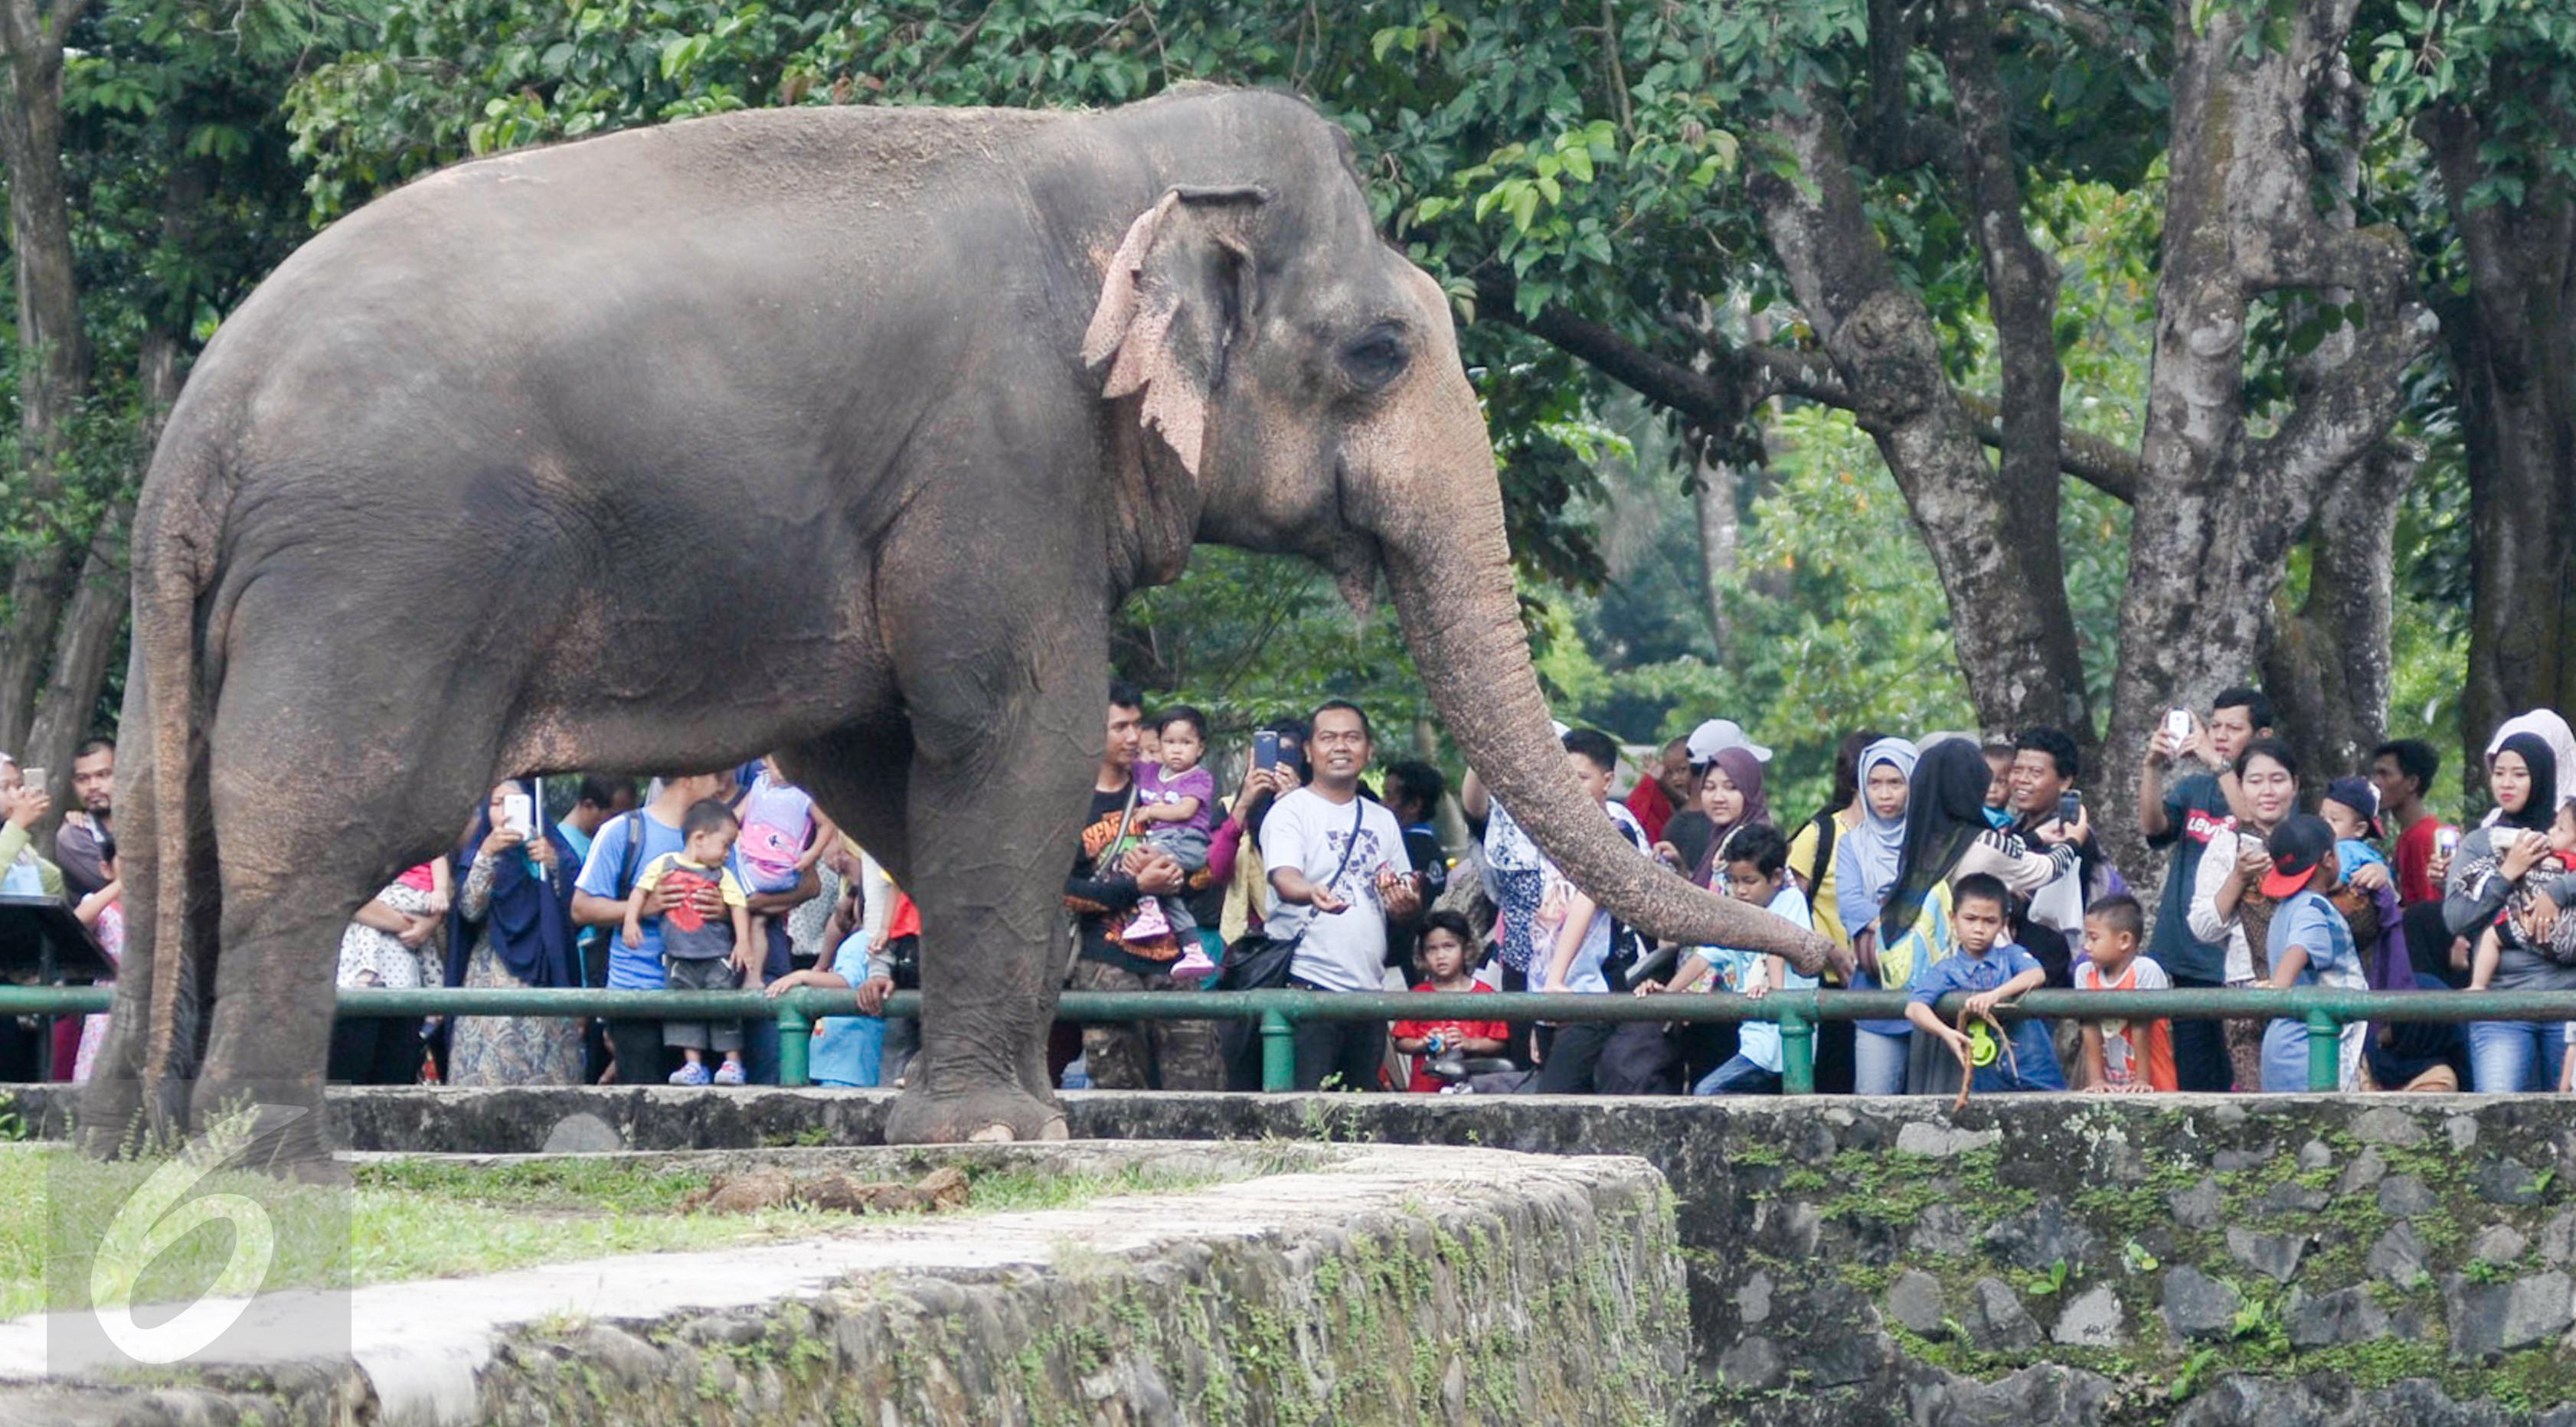 Kebun Binatang Ragunan di Antara 10 Konglomerat - News Liputan10.com